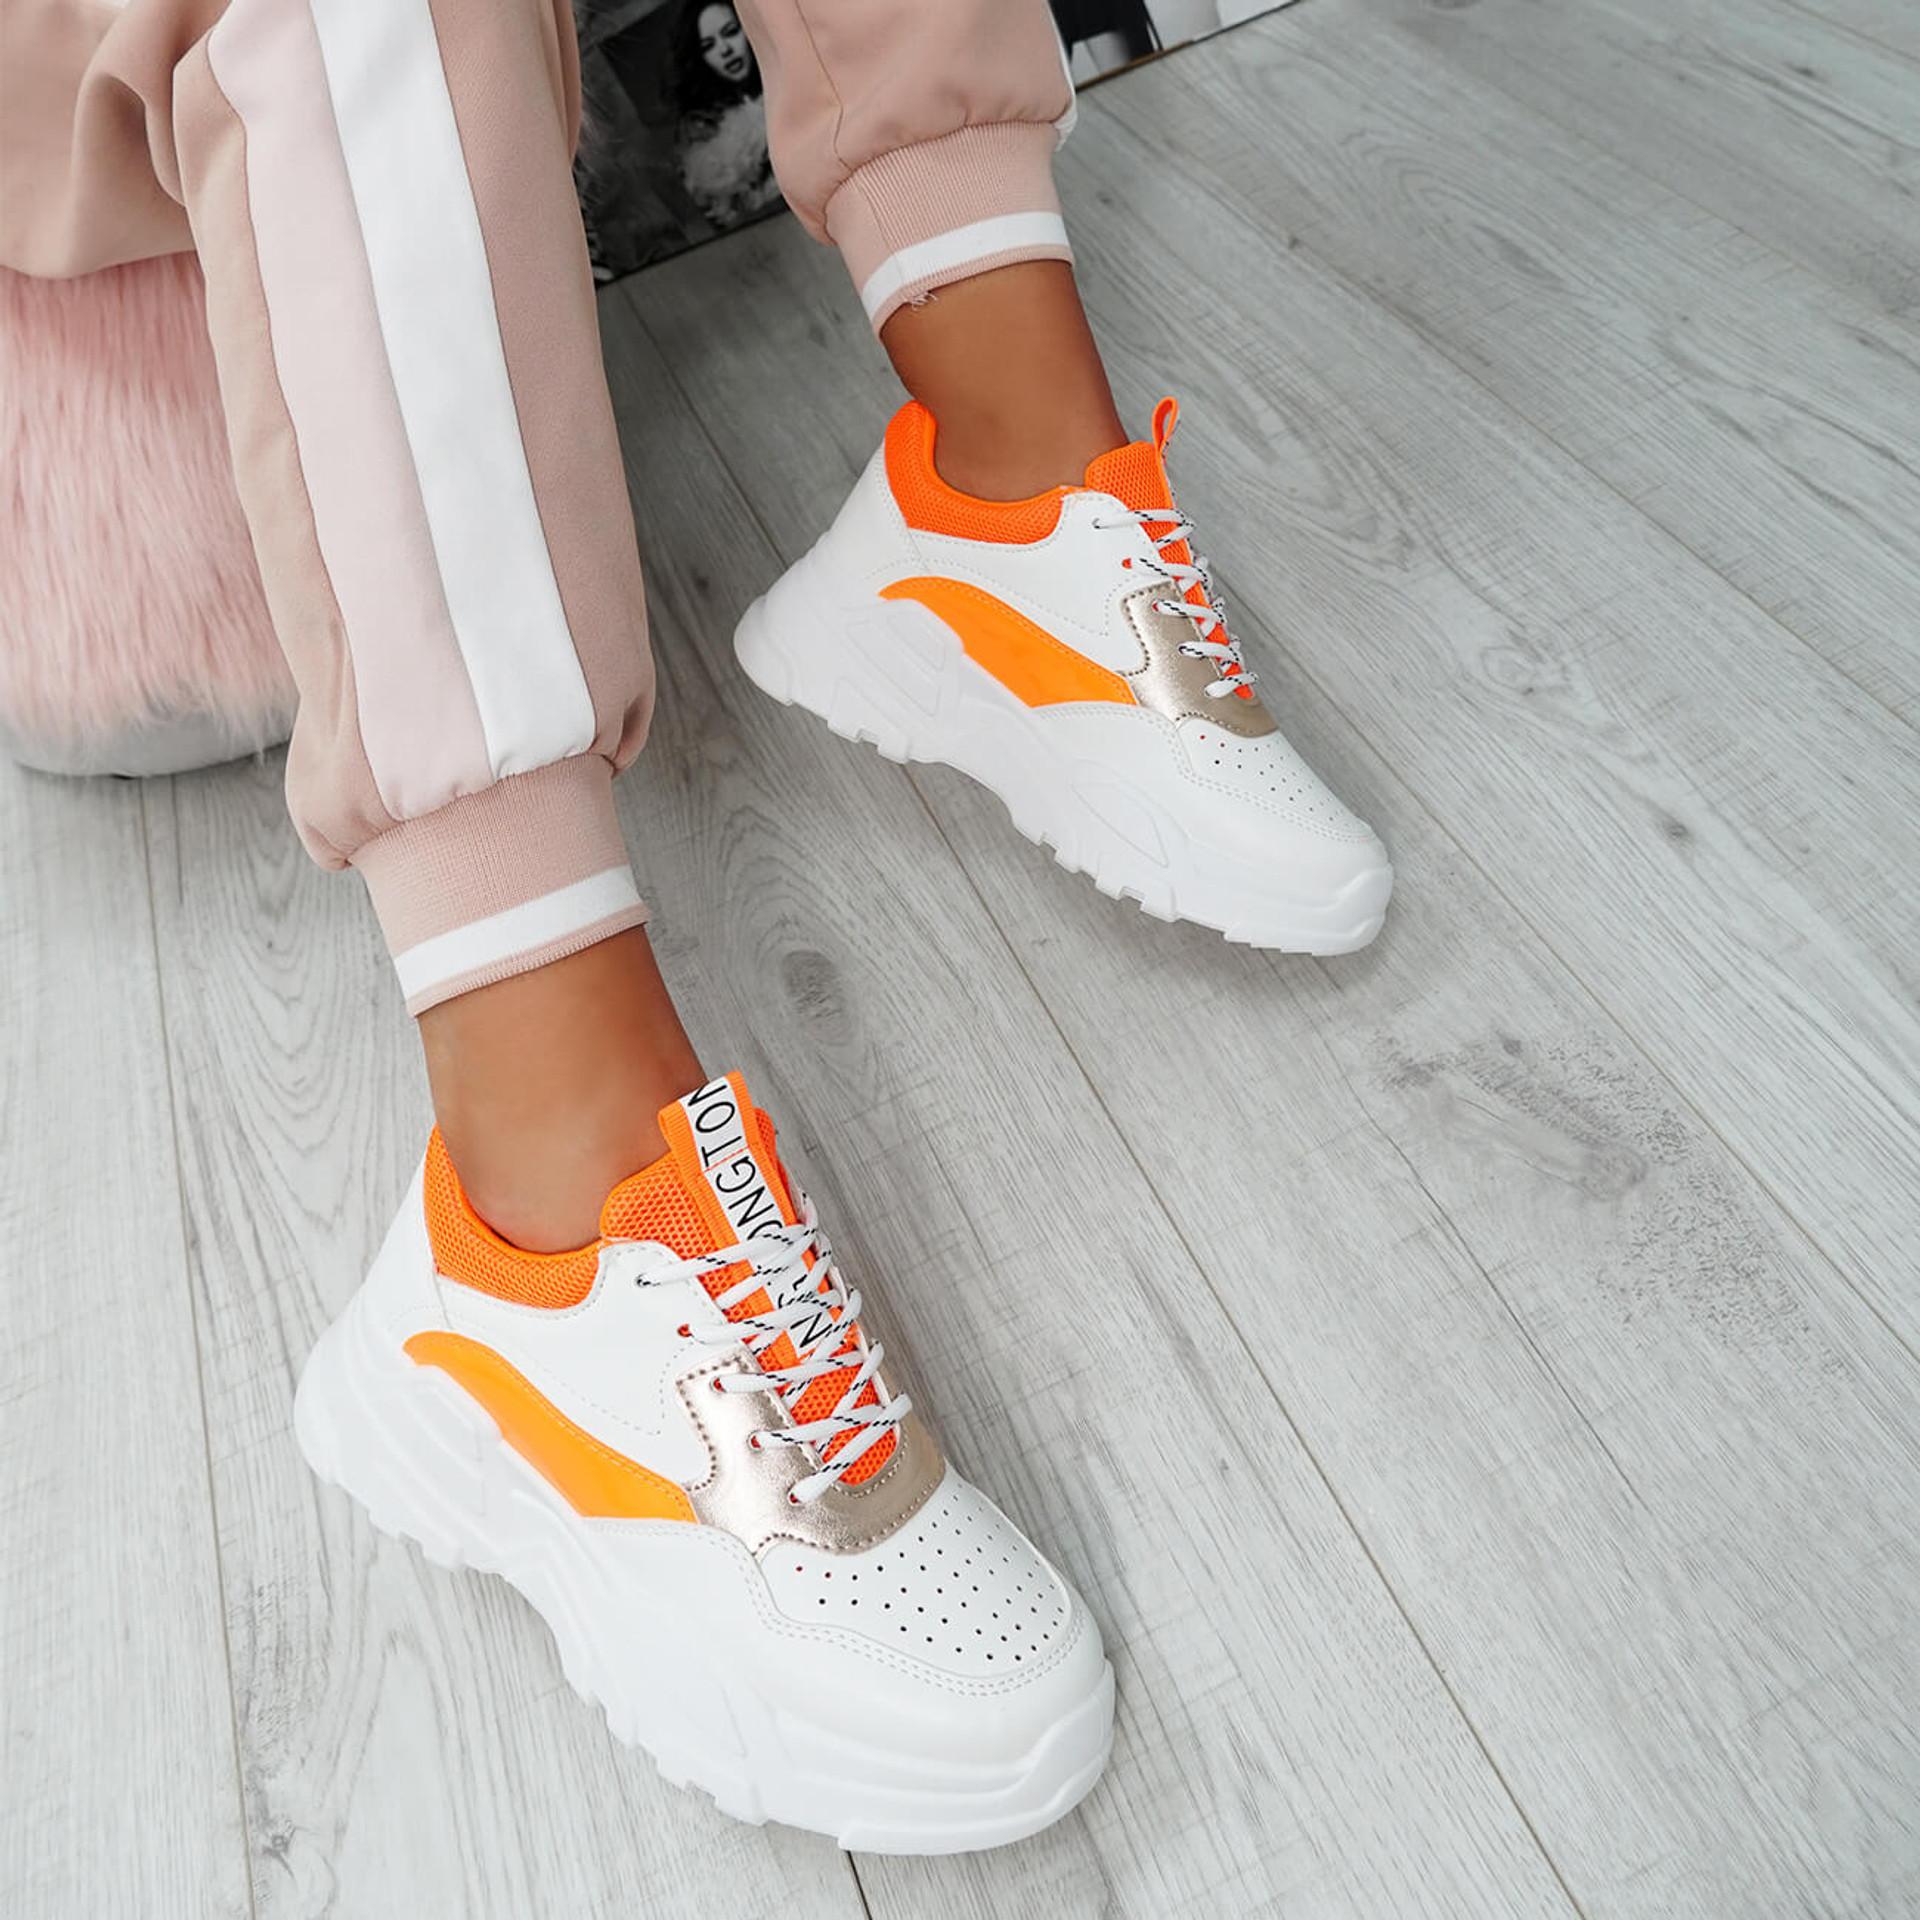 Ollex Orange Chunky Trainers